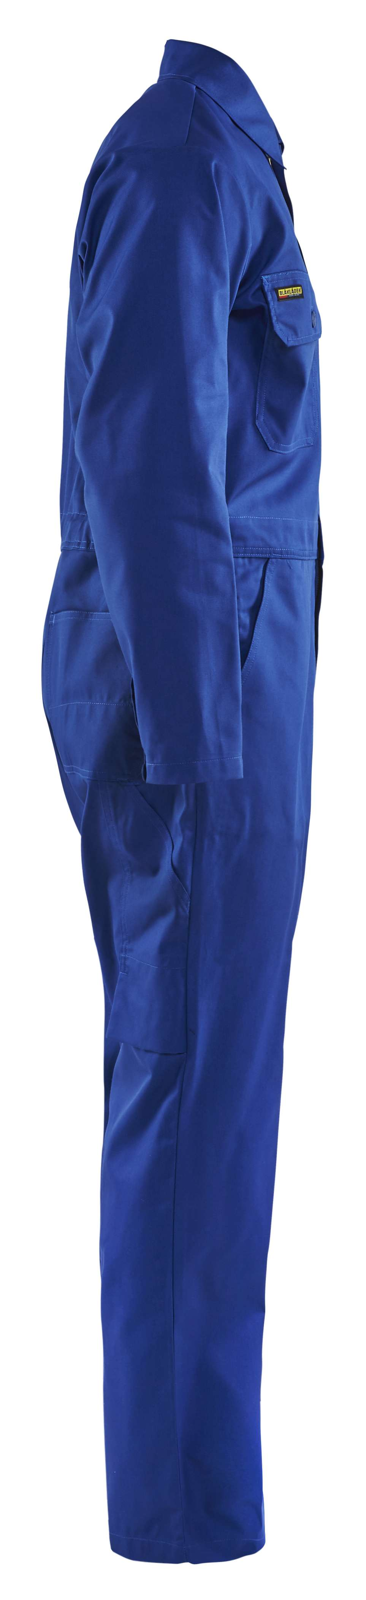 Blaklader Overalls 62701800 korenblauw(8500)